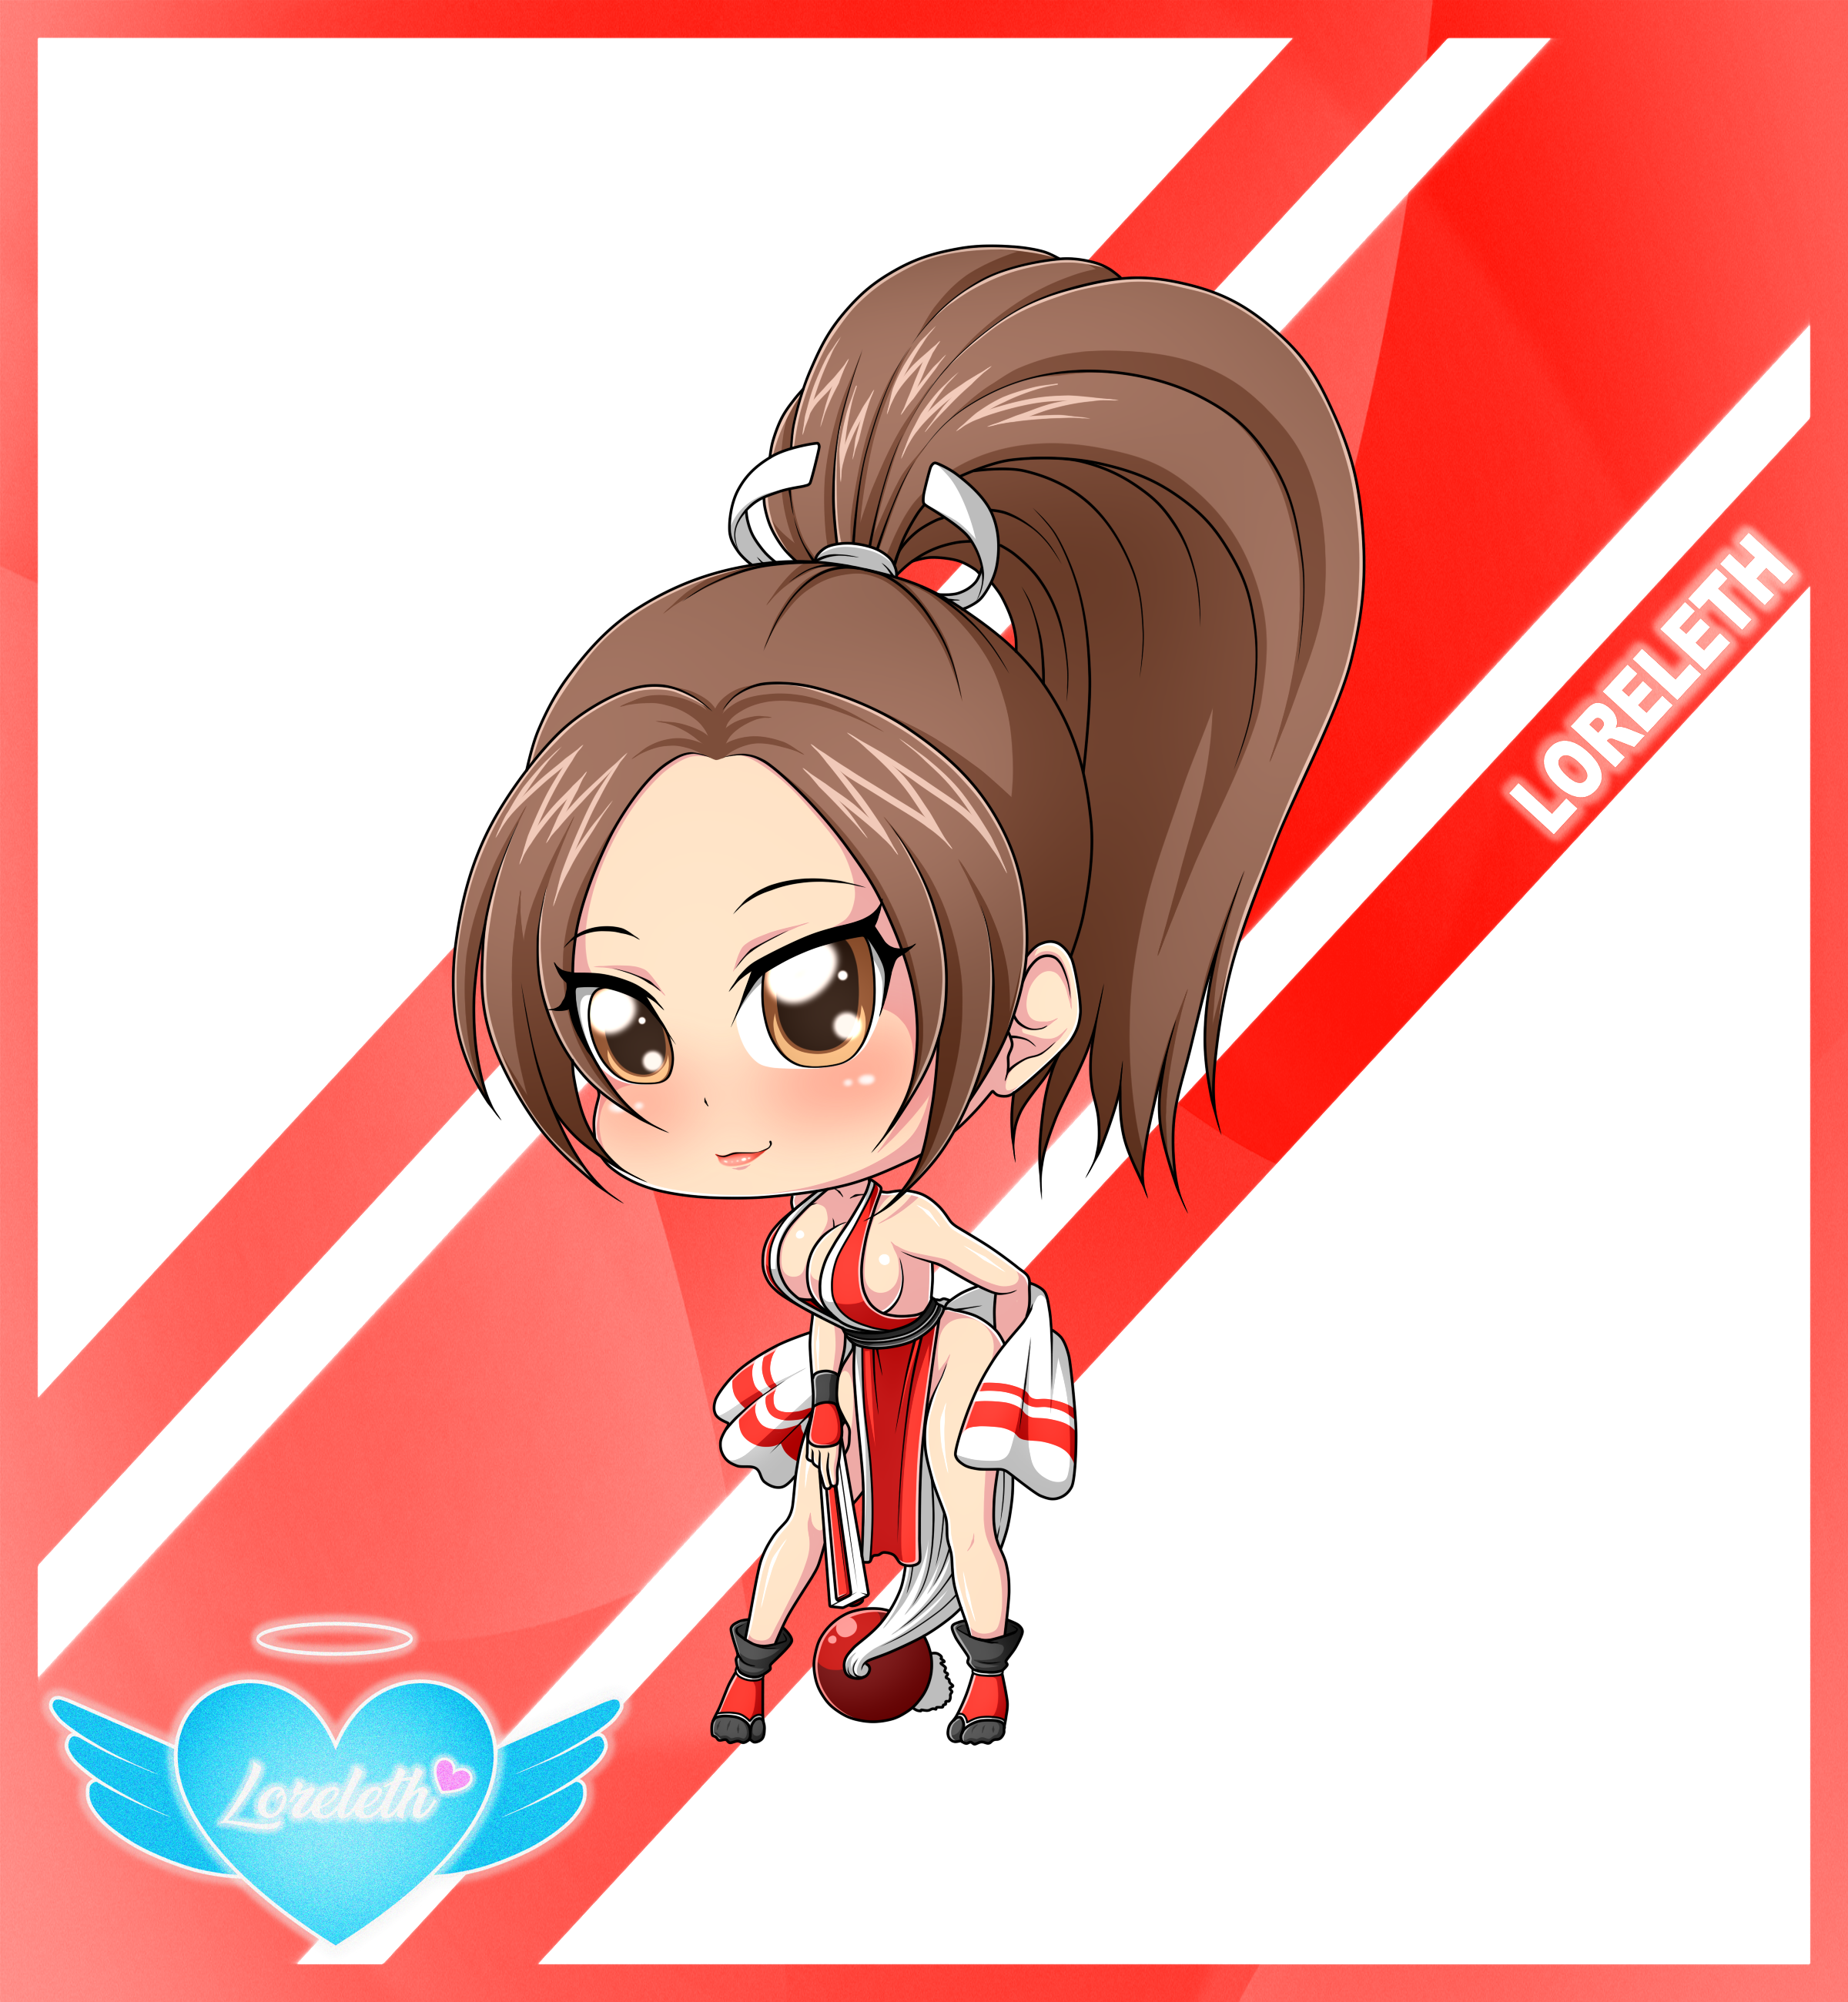 Cute Chibi Girl 54 (Commission)